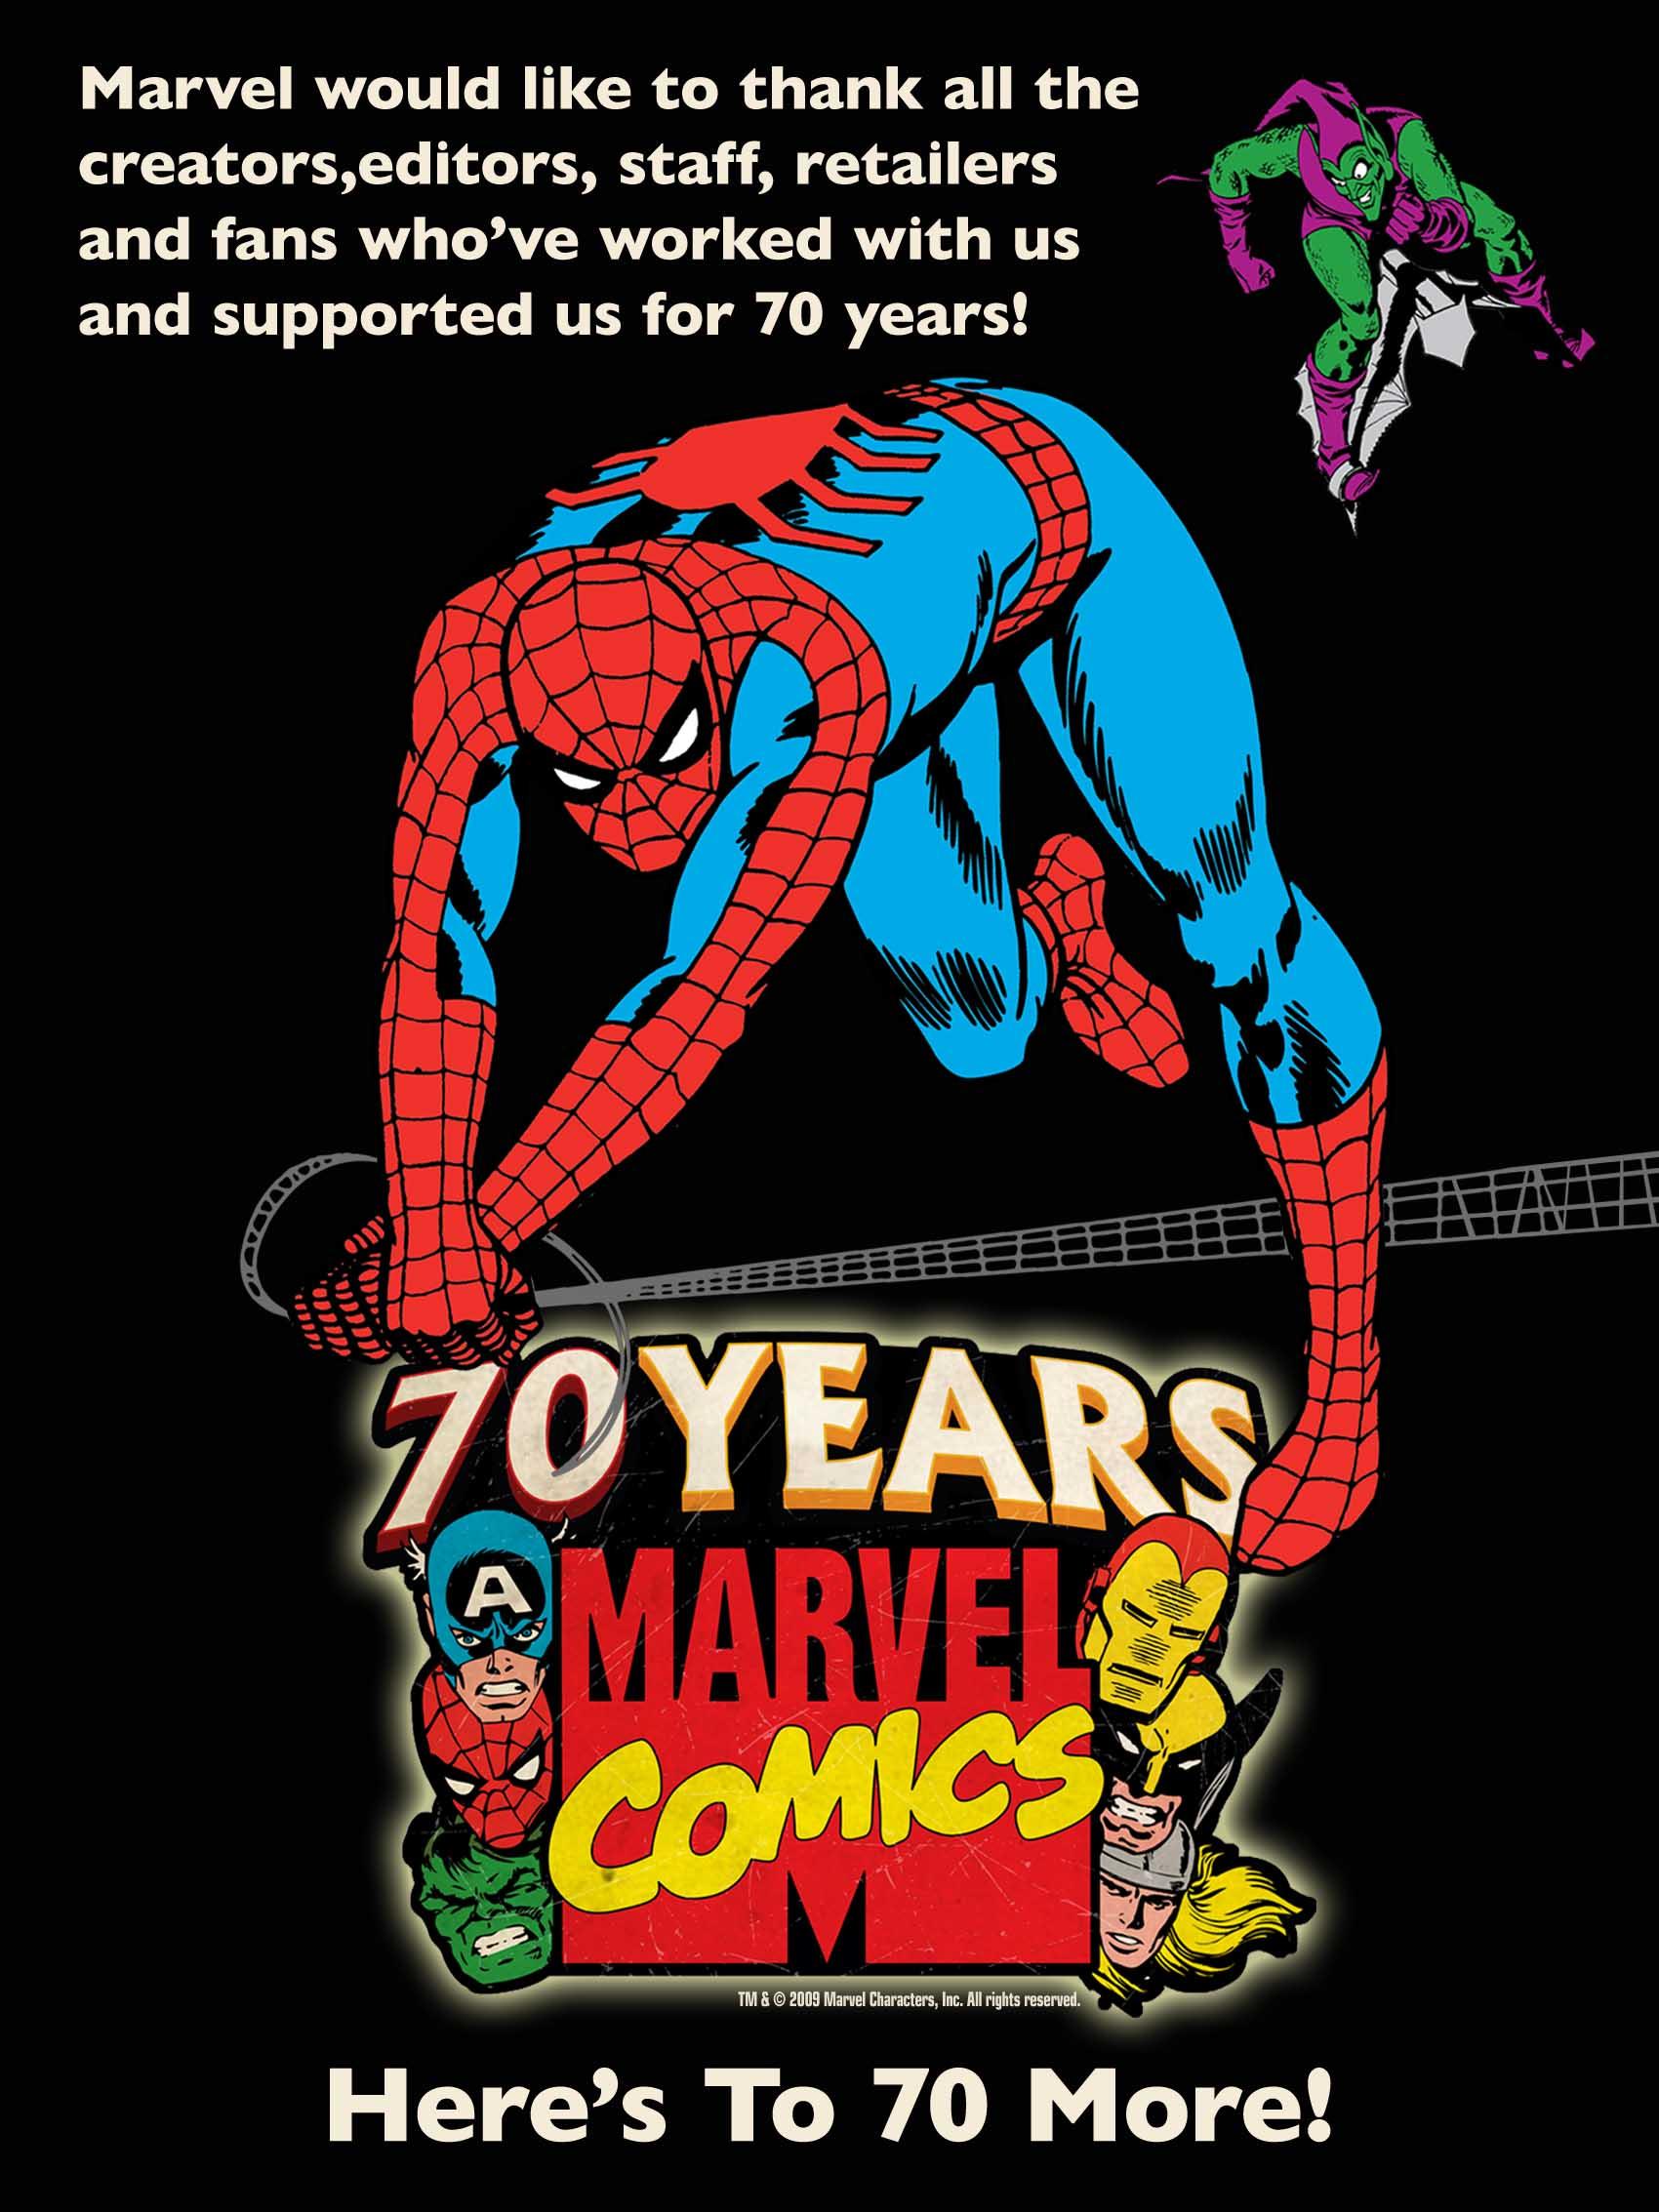 celebrating70yearsofmarvel.jpg